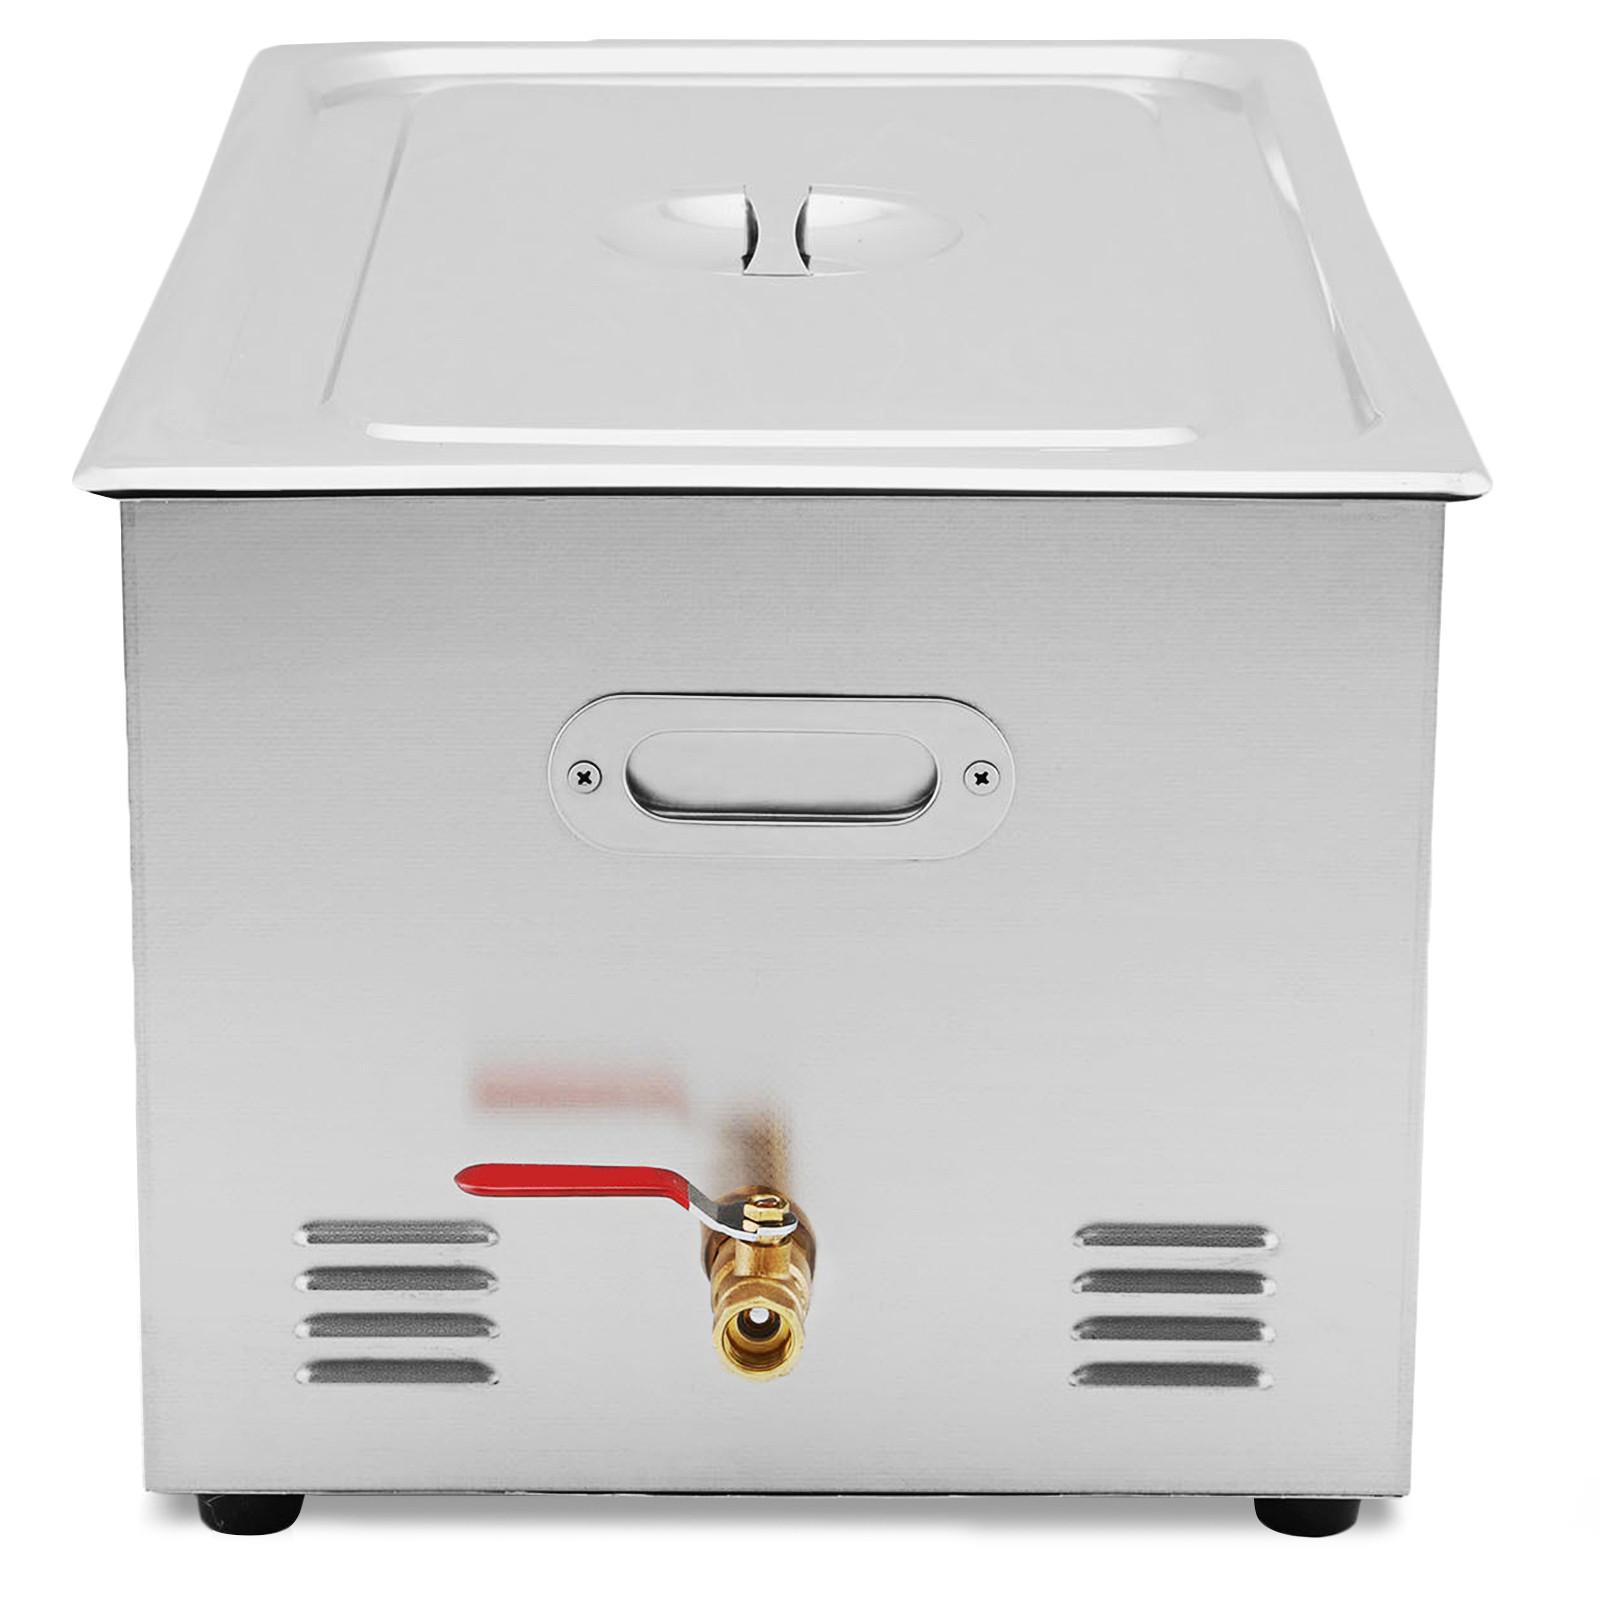 Vaschetta-Vasca-Ultrasuoni-Lavatrice-Pulitore-Ad-Ultrasuoni miniatura 99